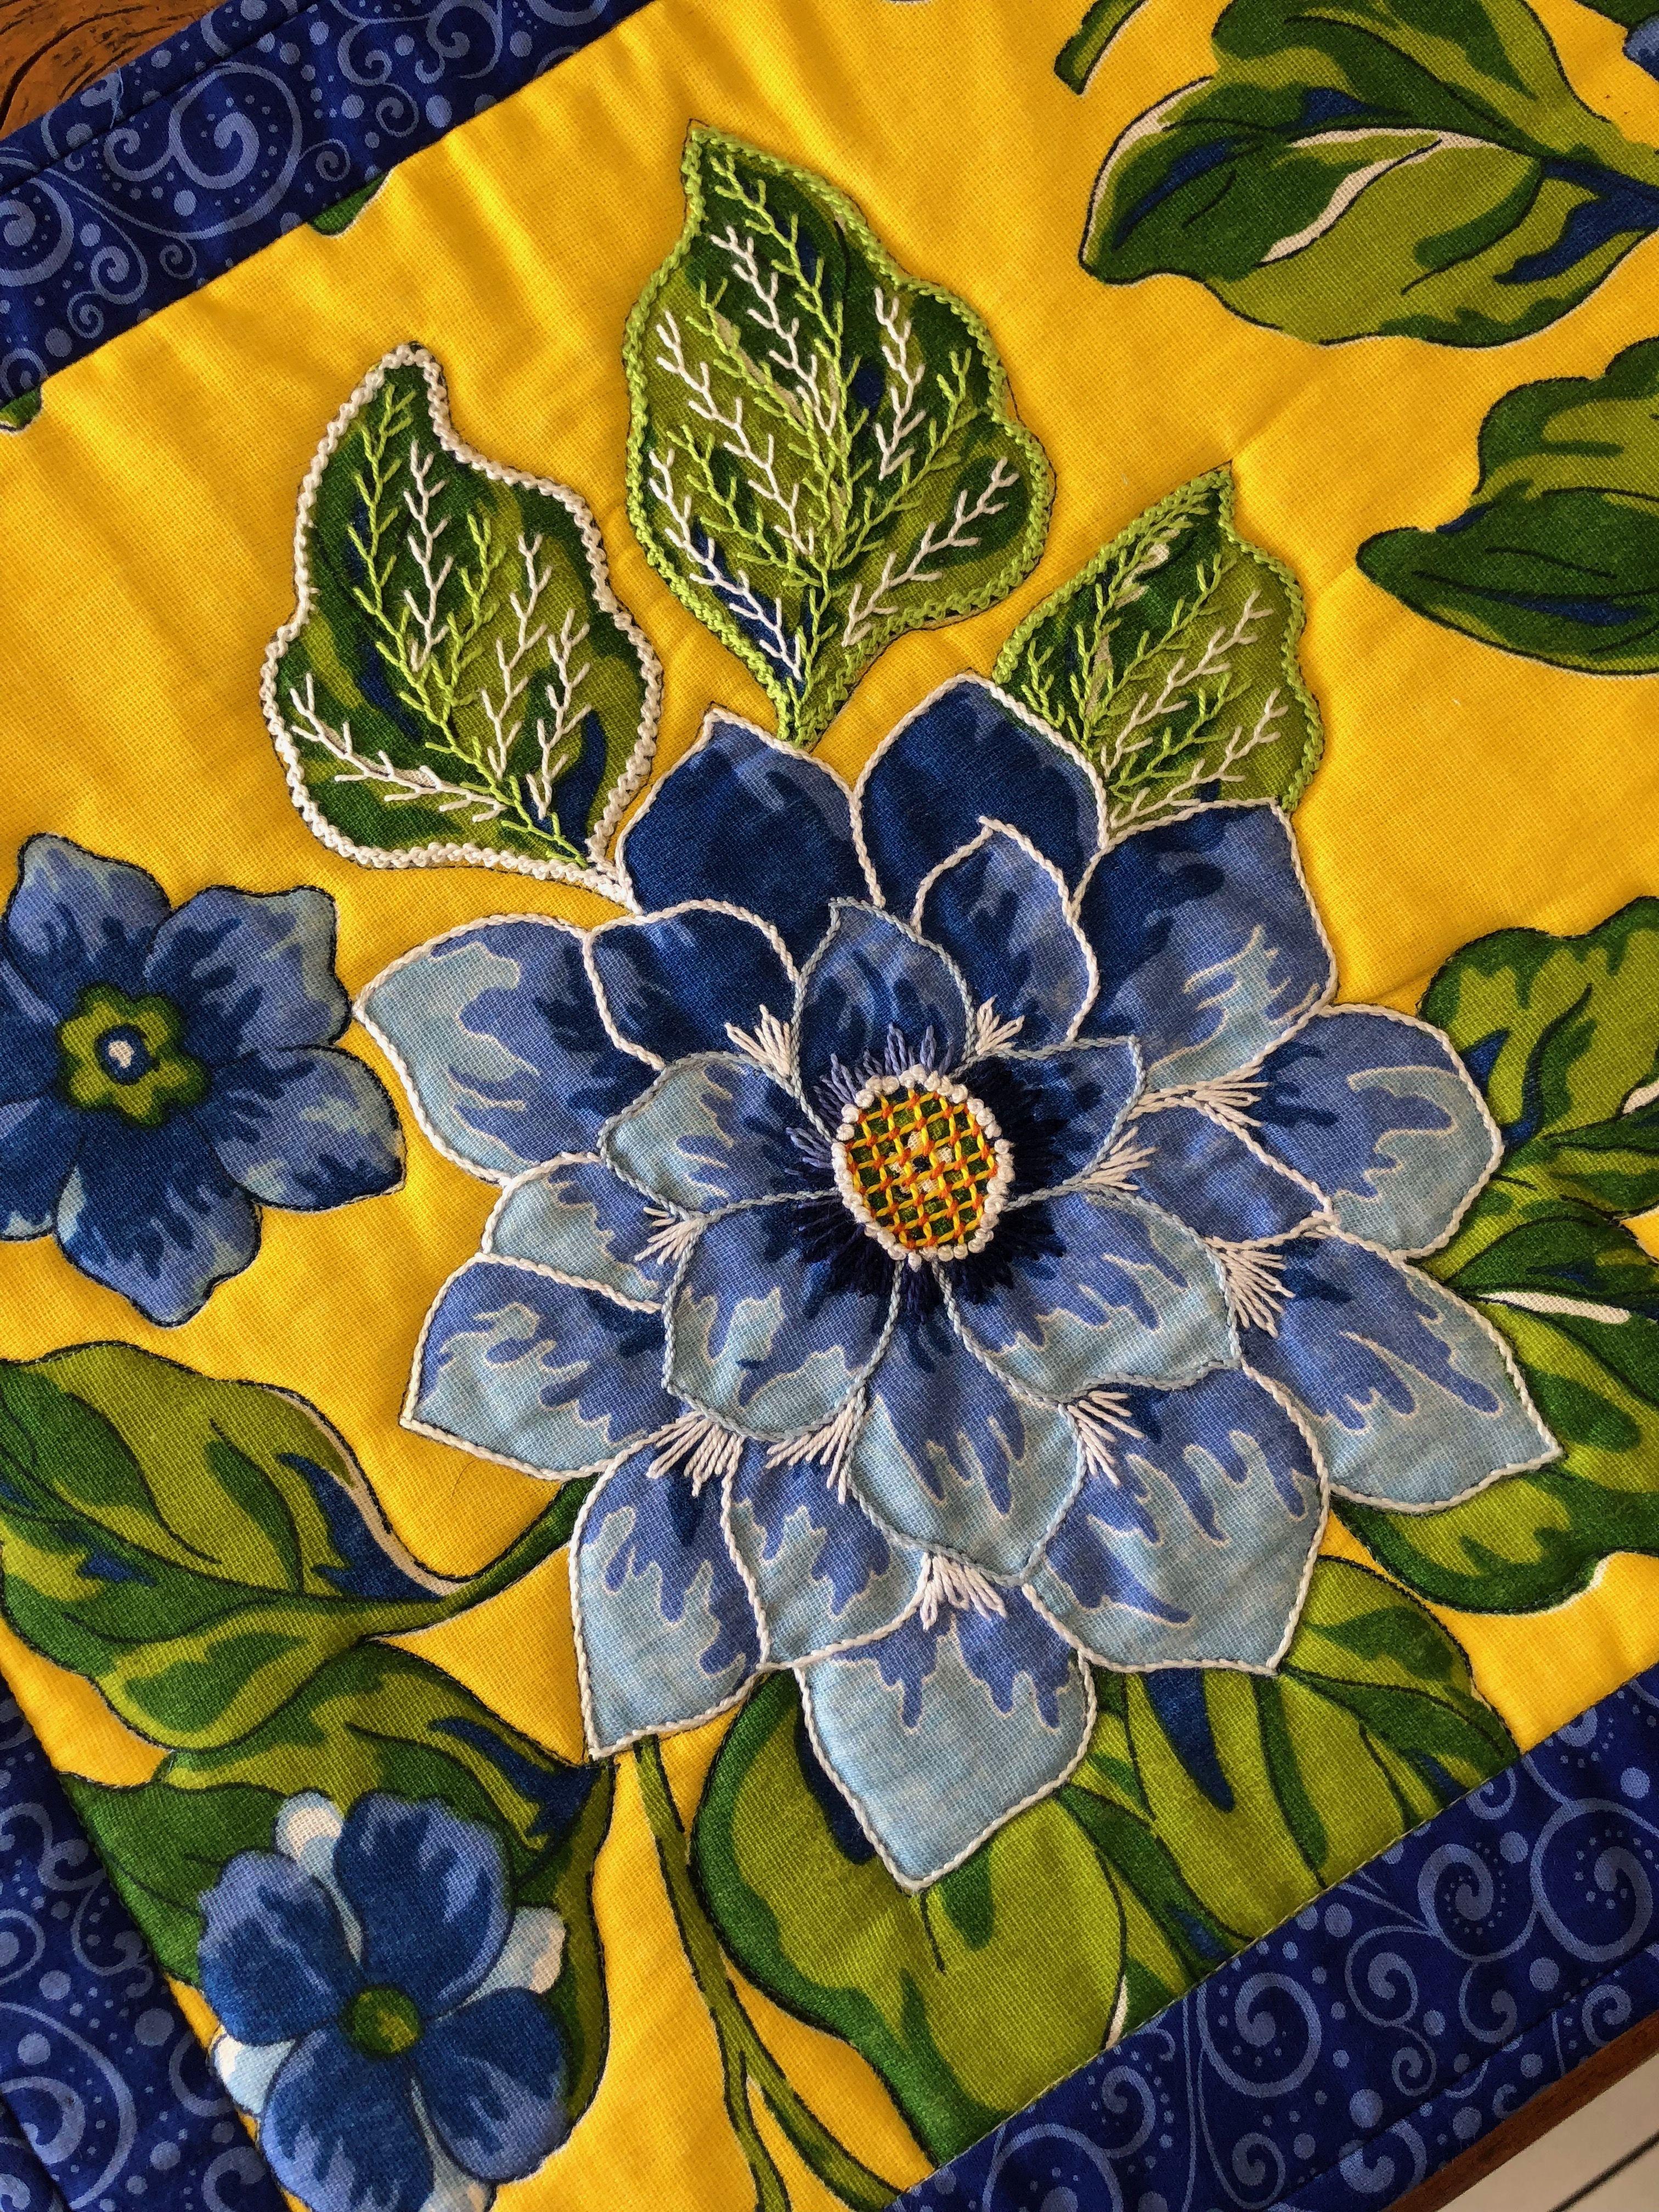 Pin by tc zeynep yüksel eterli on dikiş pinterest embroidery